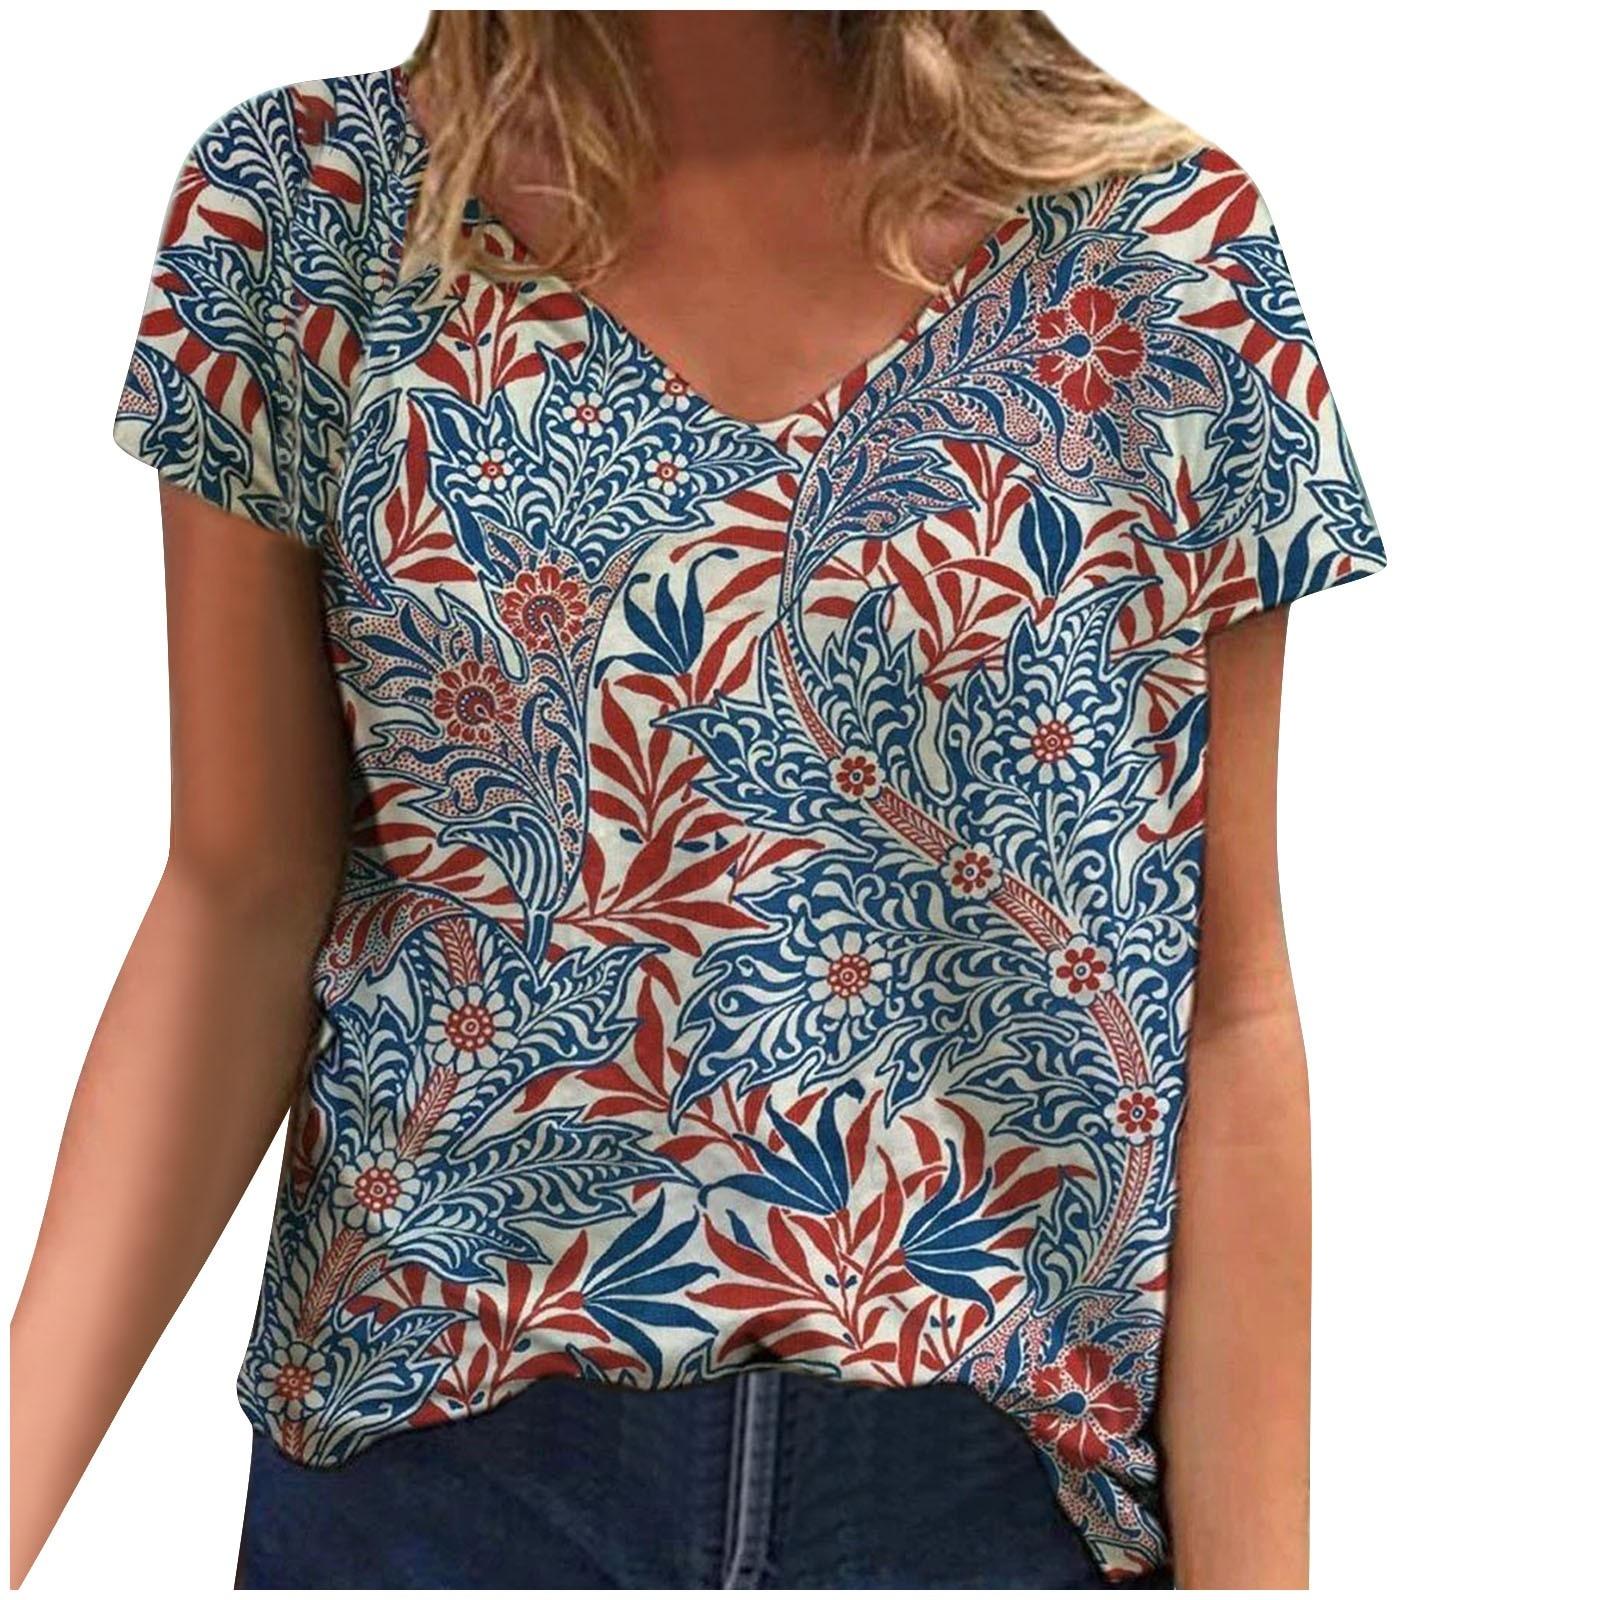 2021T-Shirts Plus Size Fashion Women Short Sleeve Printed V-Neck Tops Tee T-Shirt Female Camisetas Verano Mujer 2020 T-Shirt